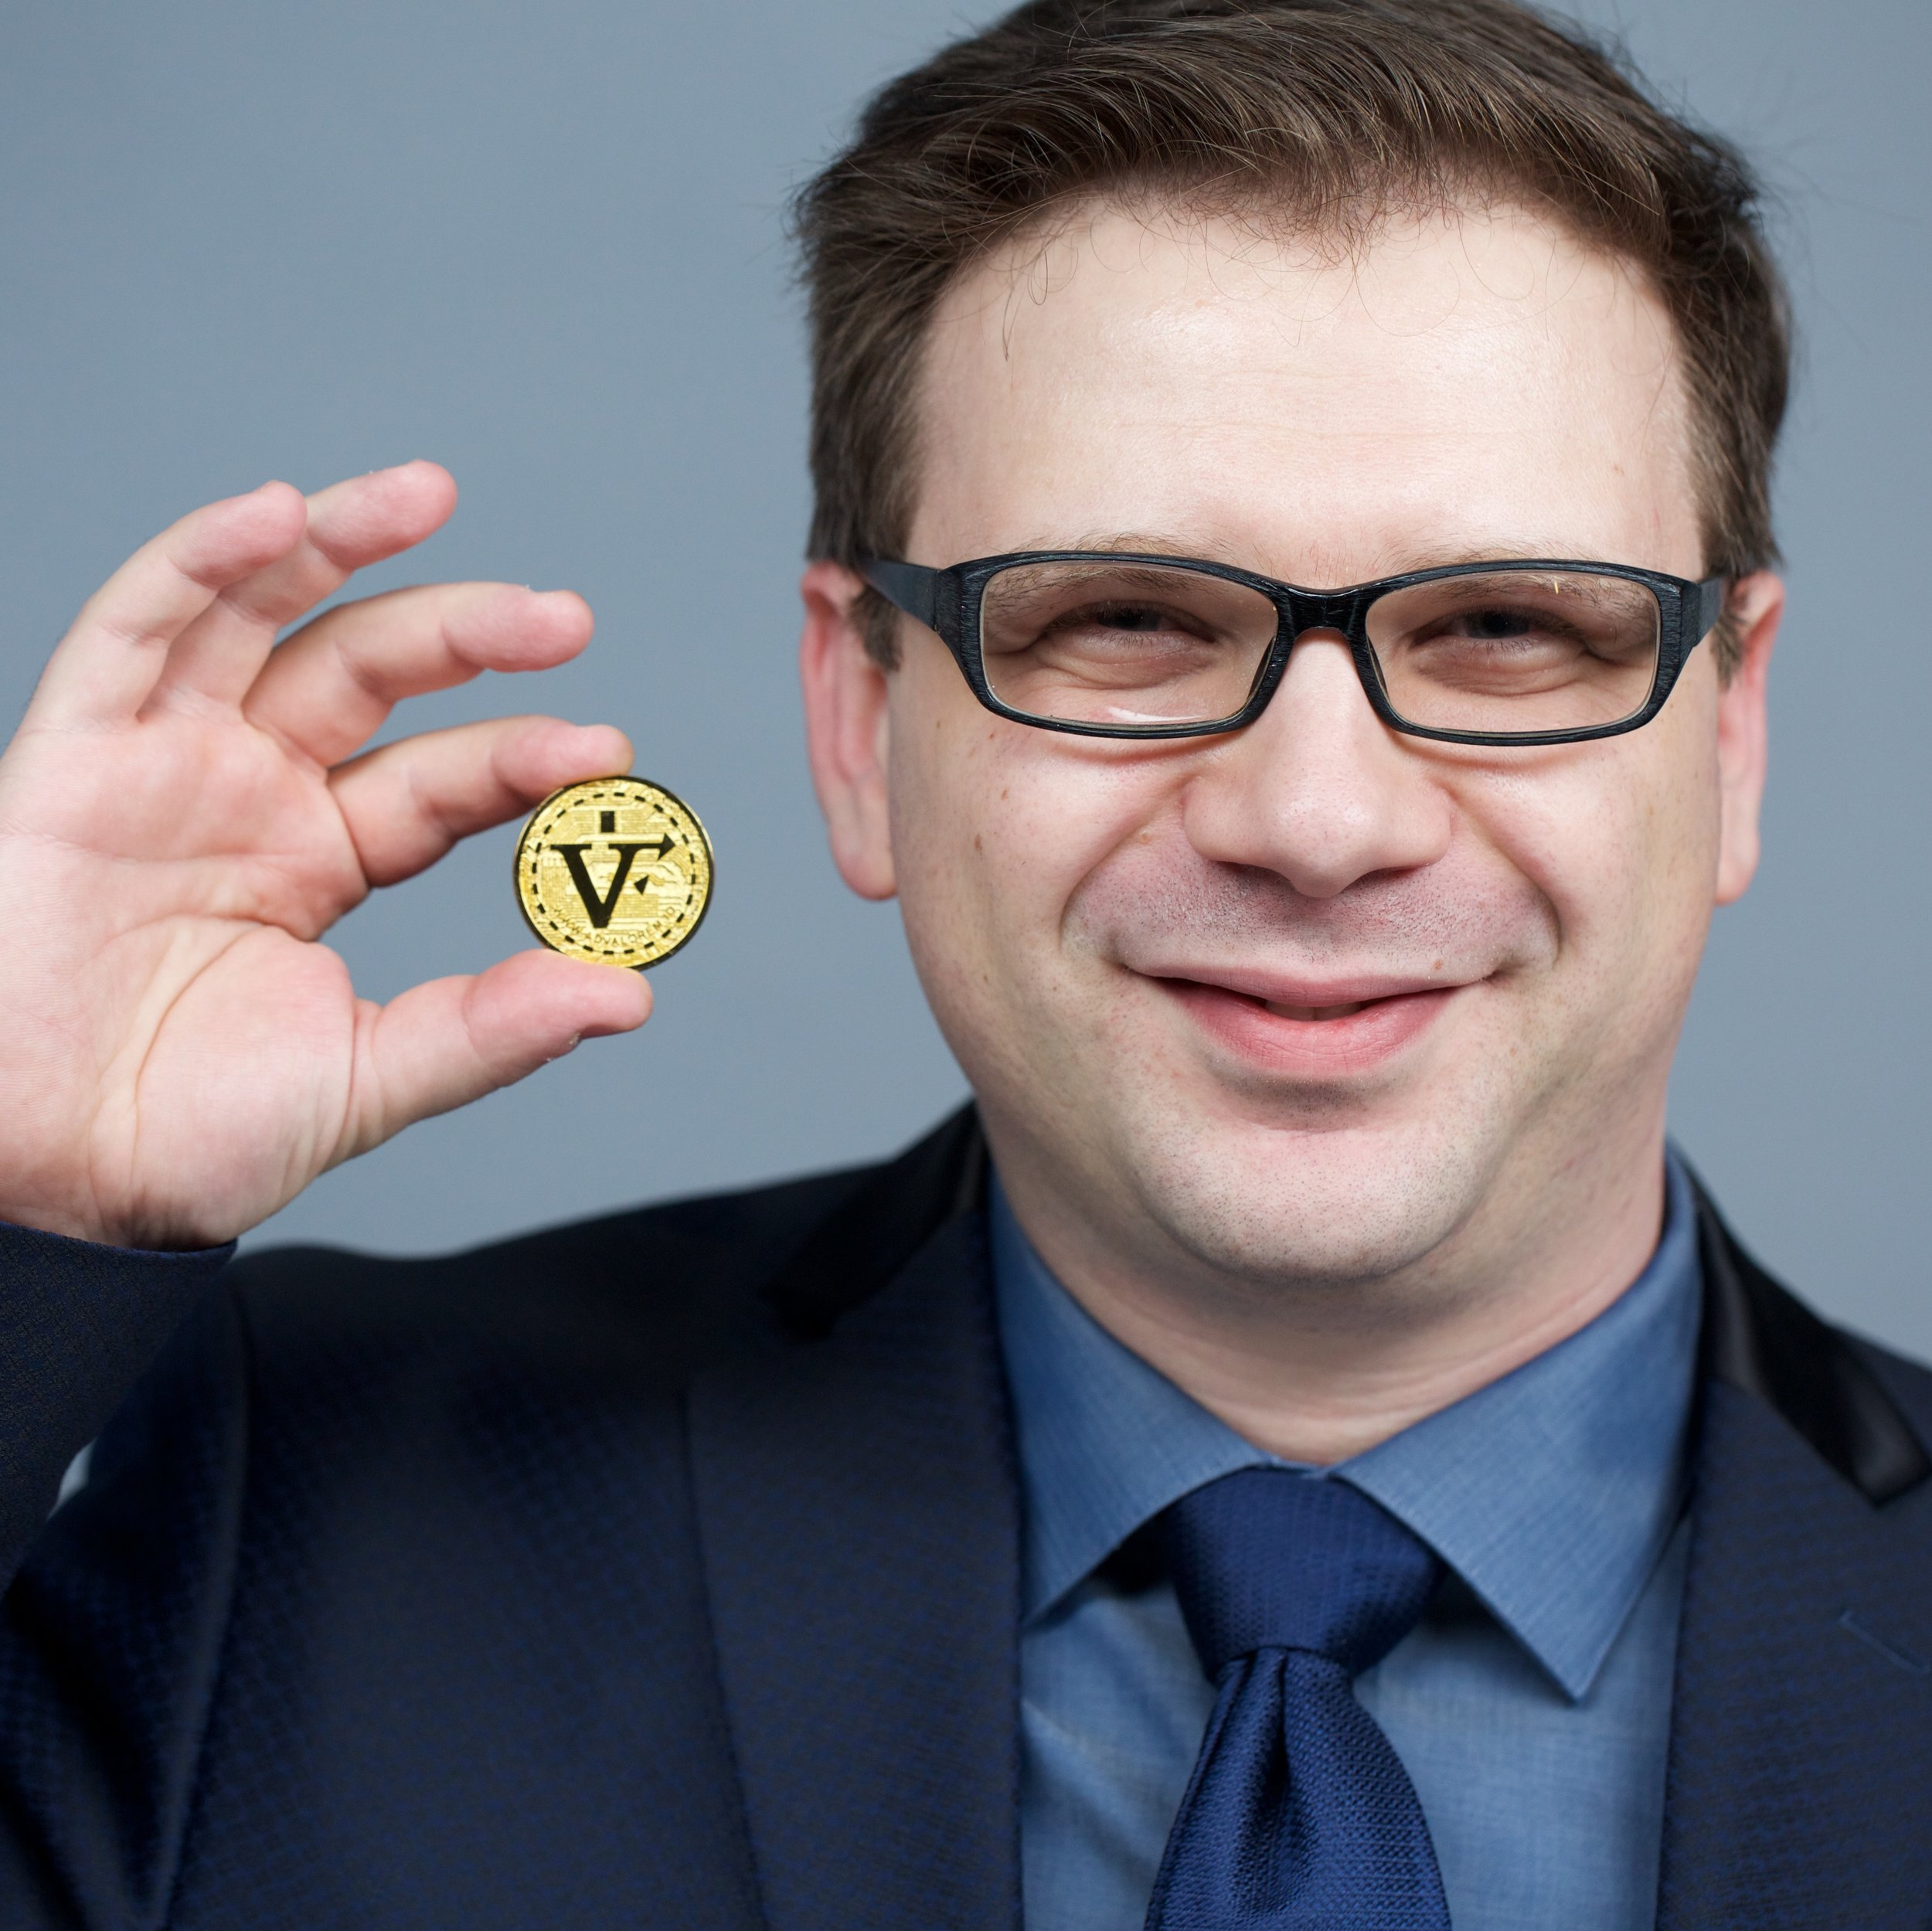 Val Kleyman - CEO & Founder